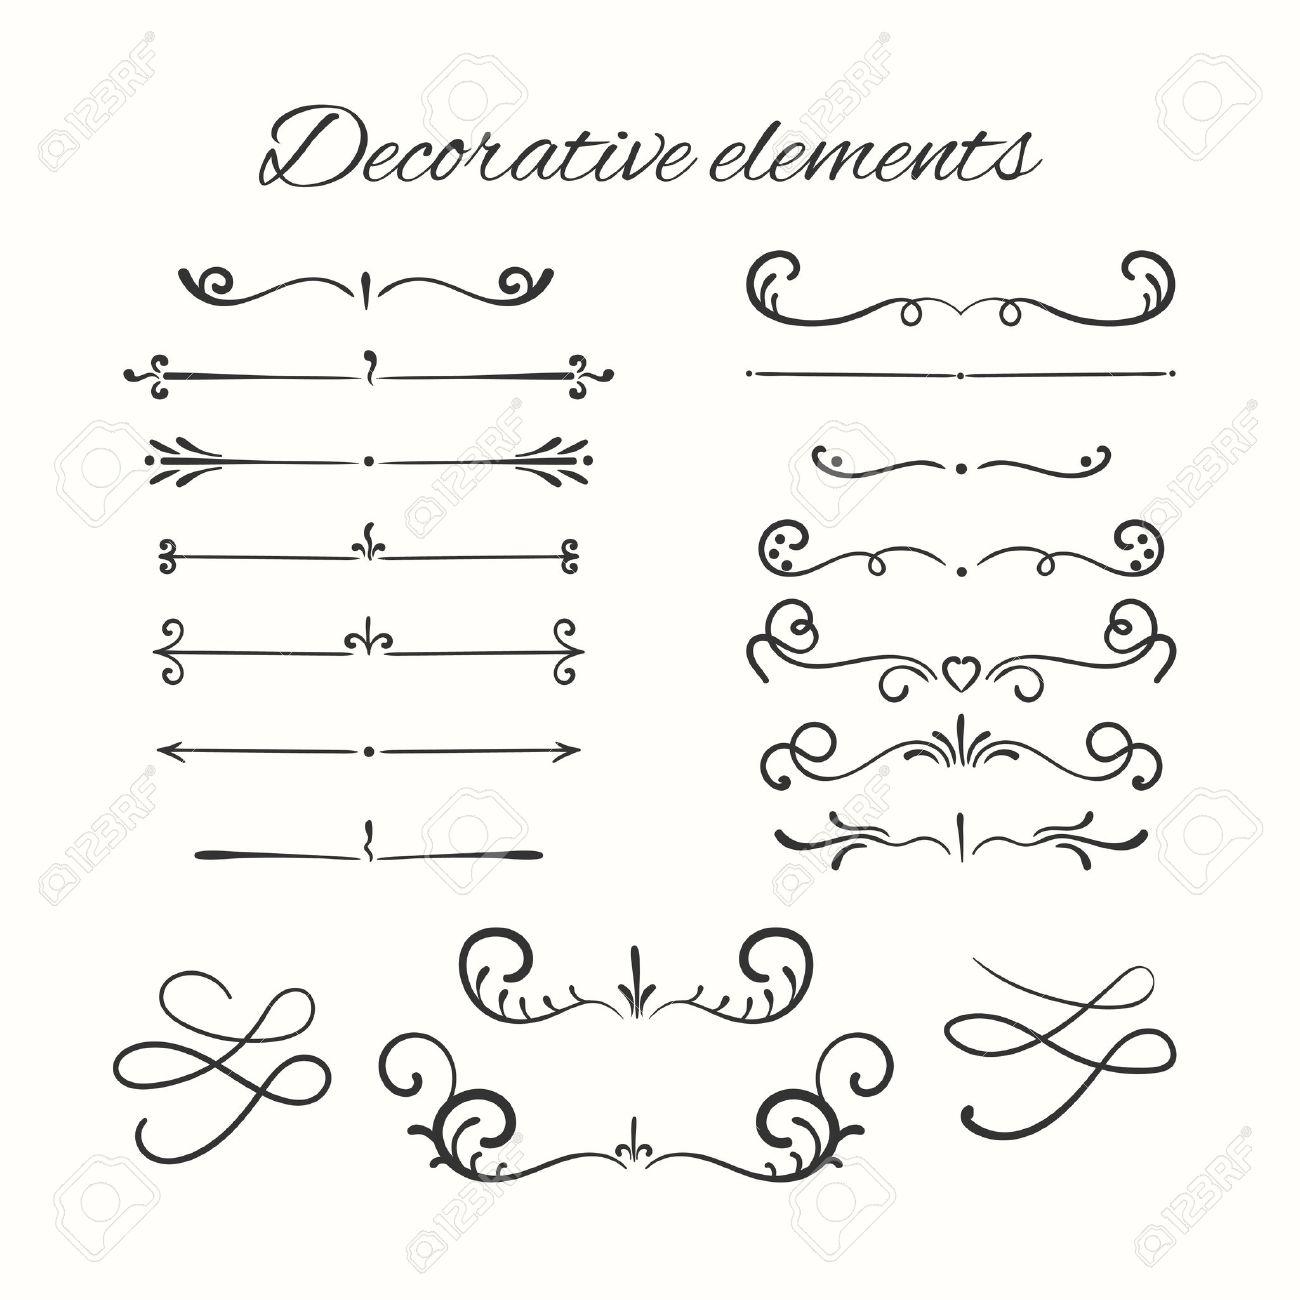 Hand drawn dividers set. Ornamental decorative elements. Vector ornate elements design. - 51559254